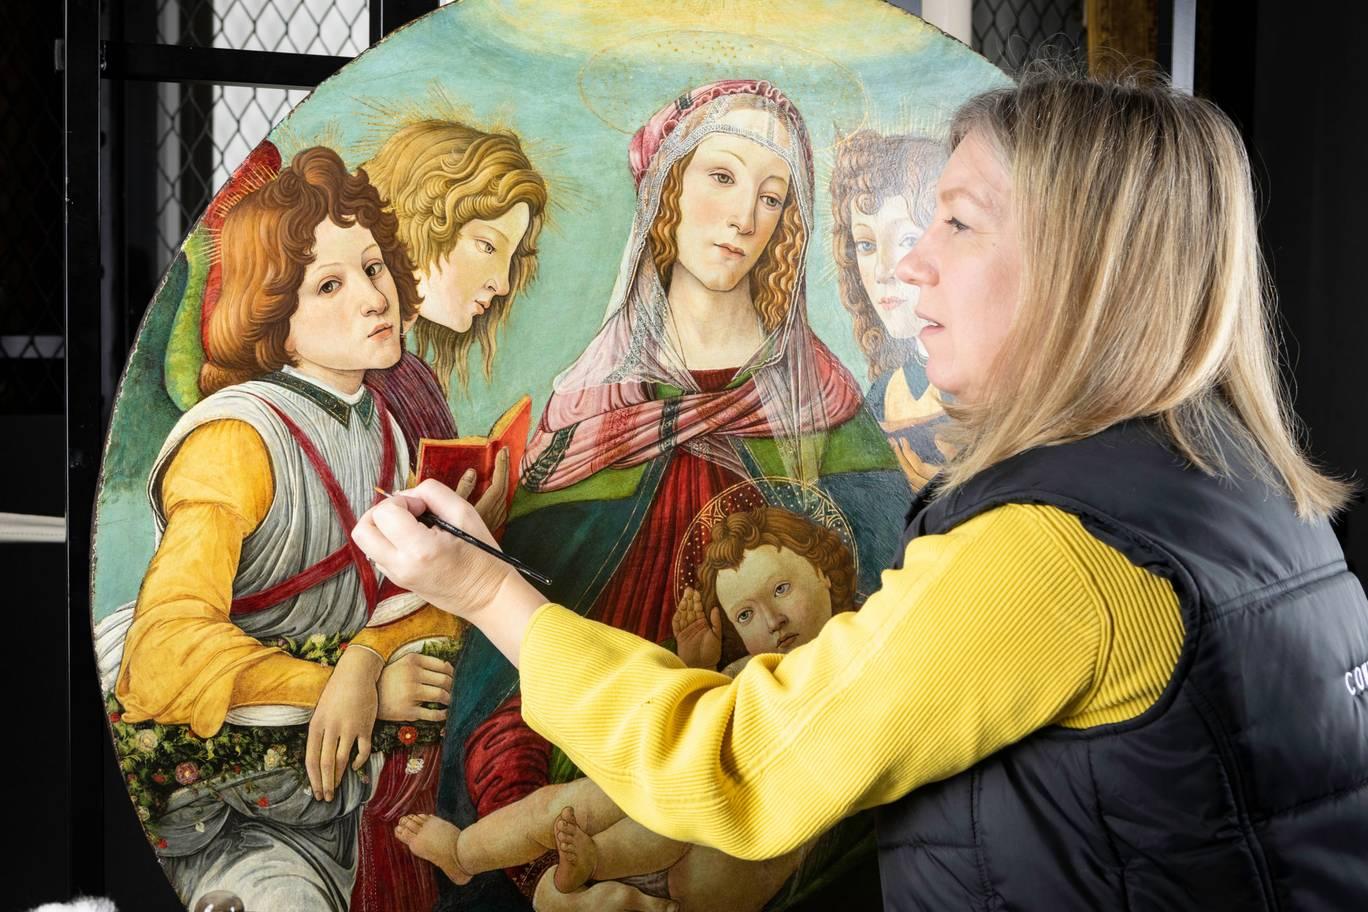 ARTS-Botticelli-06593158.jpg